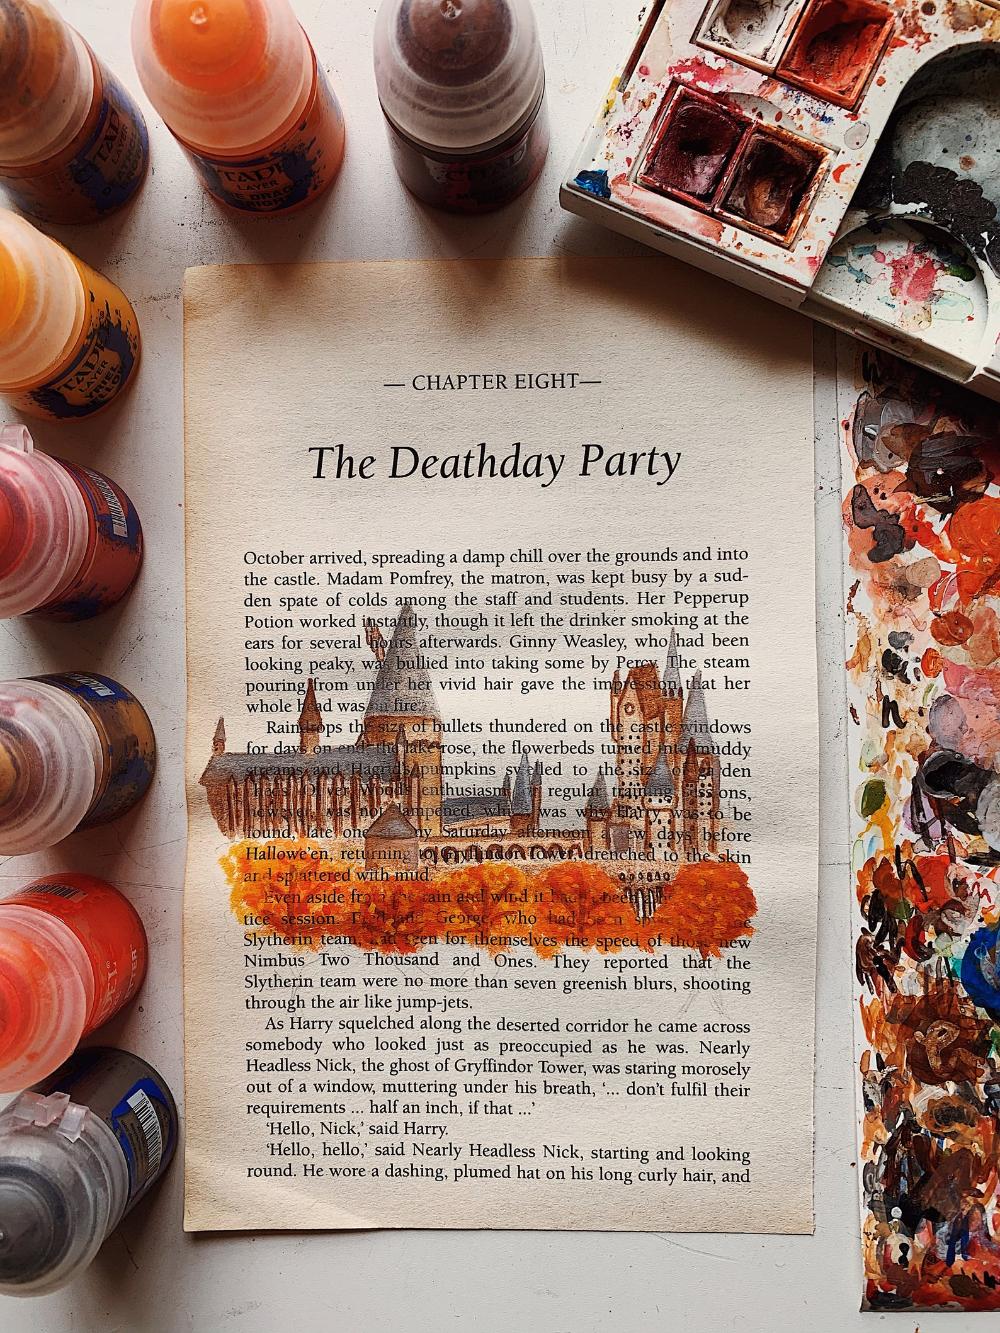 Autumn Hogwarts Inspired Acrylic Harry Potter Book Page Etsy In 2020 Harry Potter Artwork Harry Potter Sketch Harry Potter Aesthetic